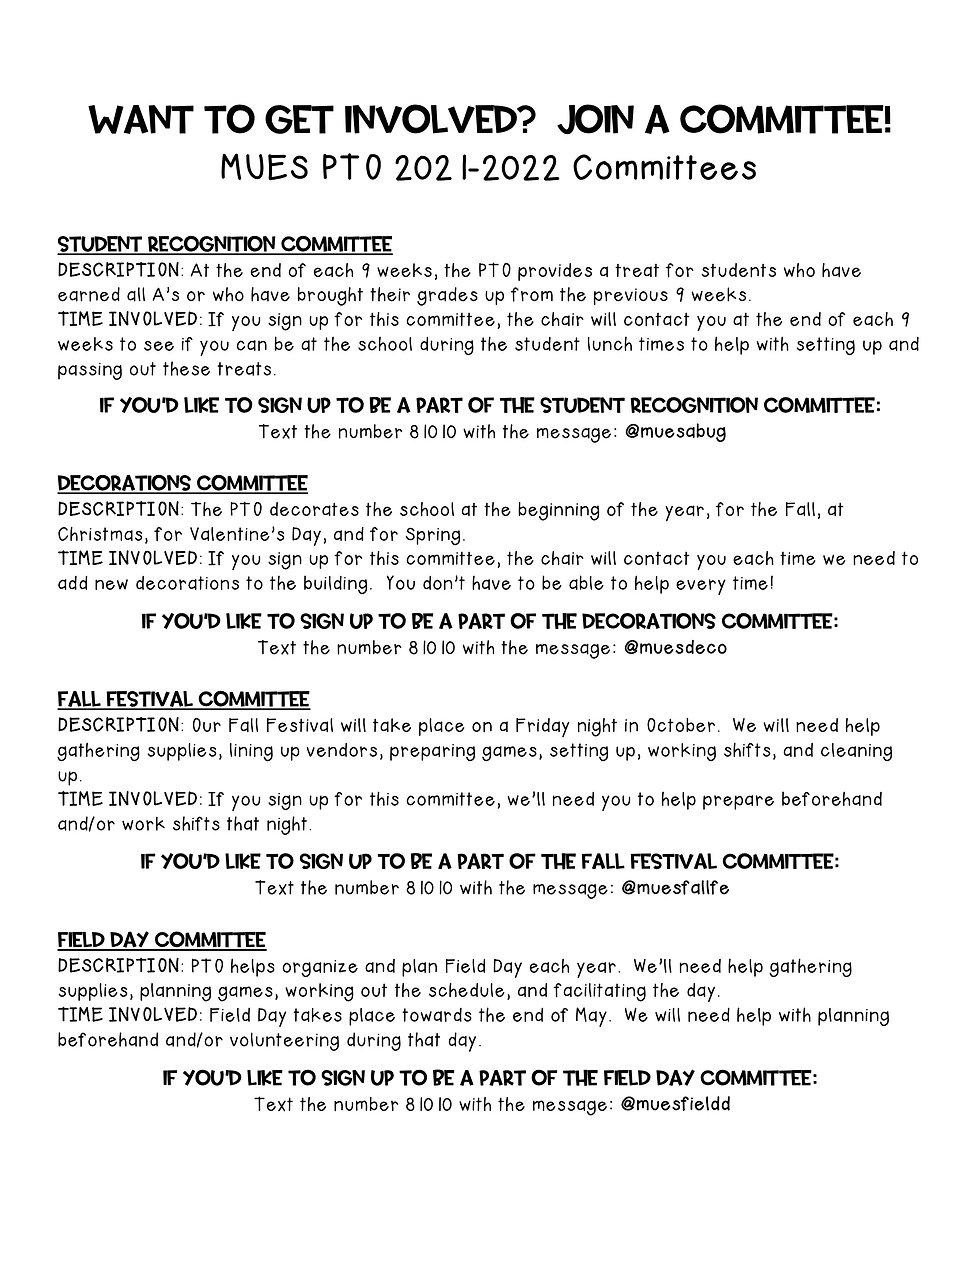 2021-2022 Committee Flyer-1.jpg